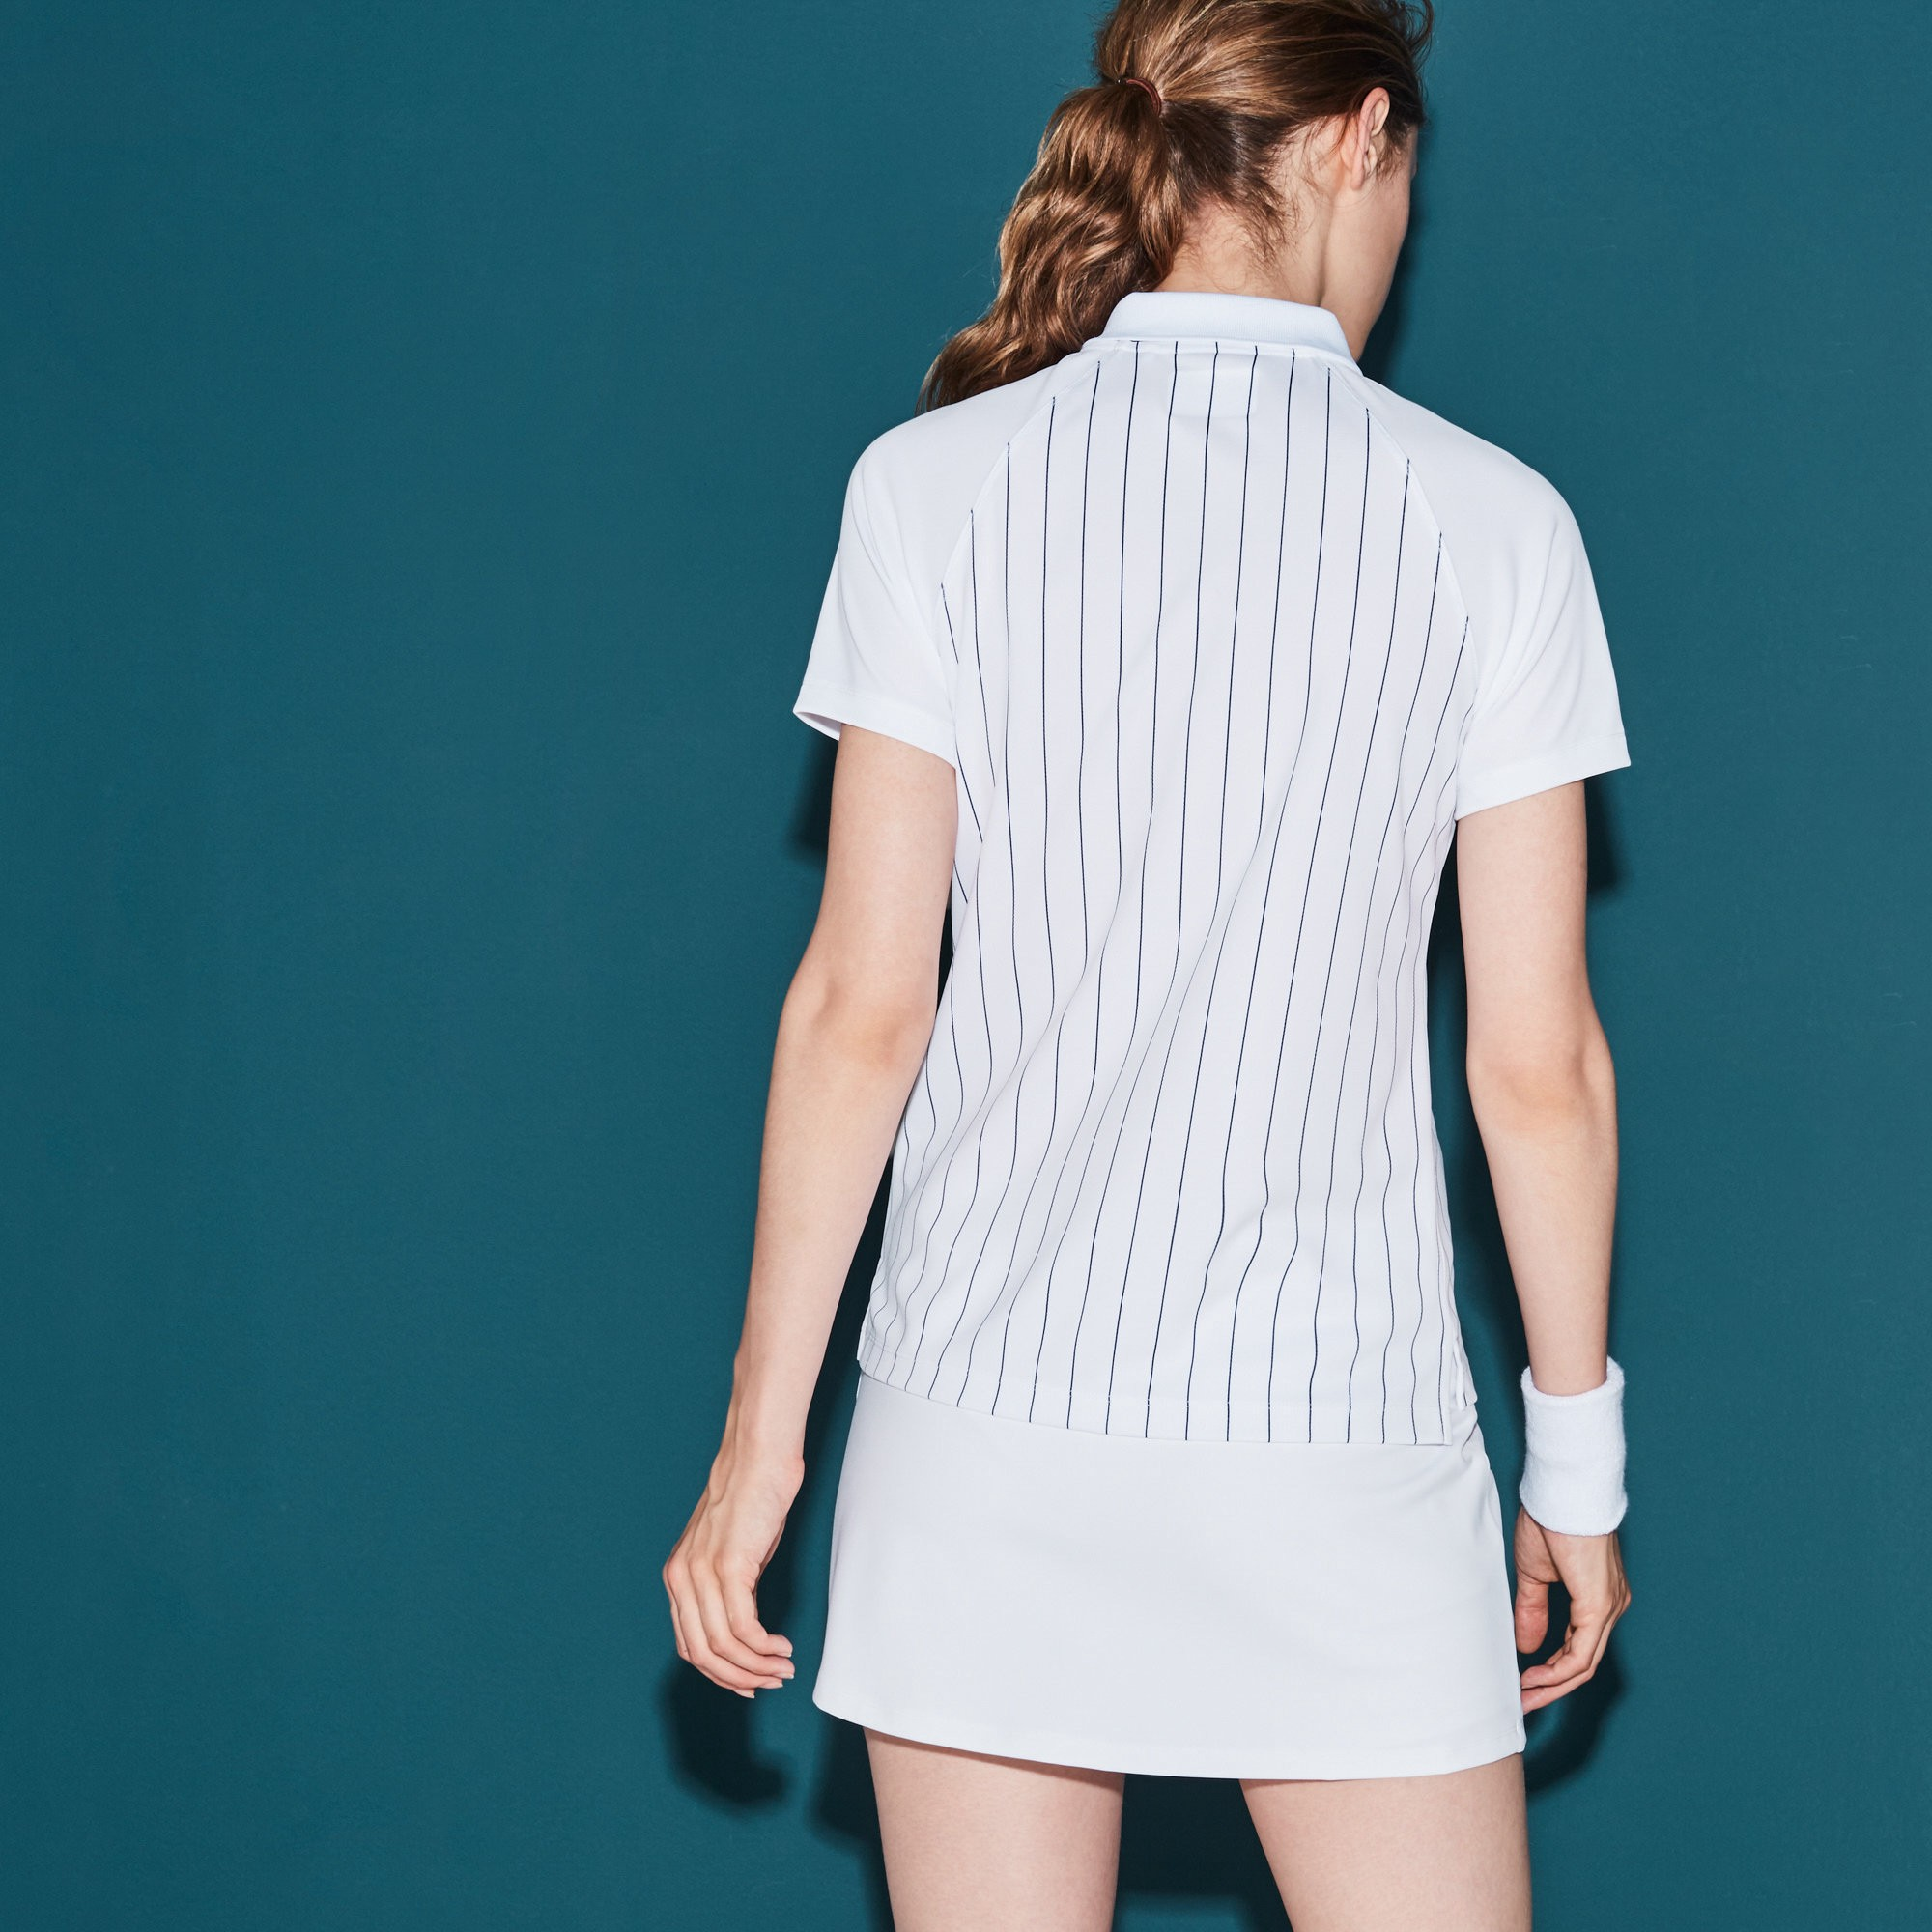 1b9dfe9d7b971 Lacoste Women s Sport Tennis Zip Neck Striped Tech Piqué Polo - White Ocean  Blue 10